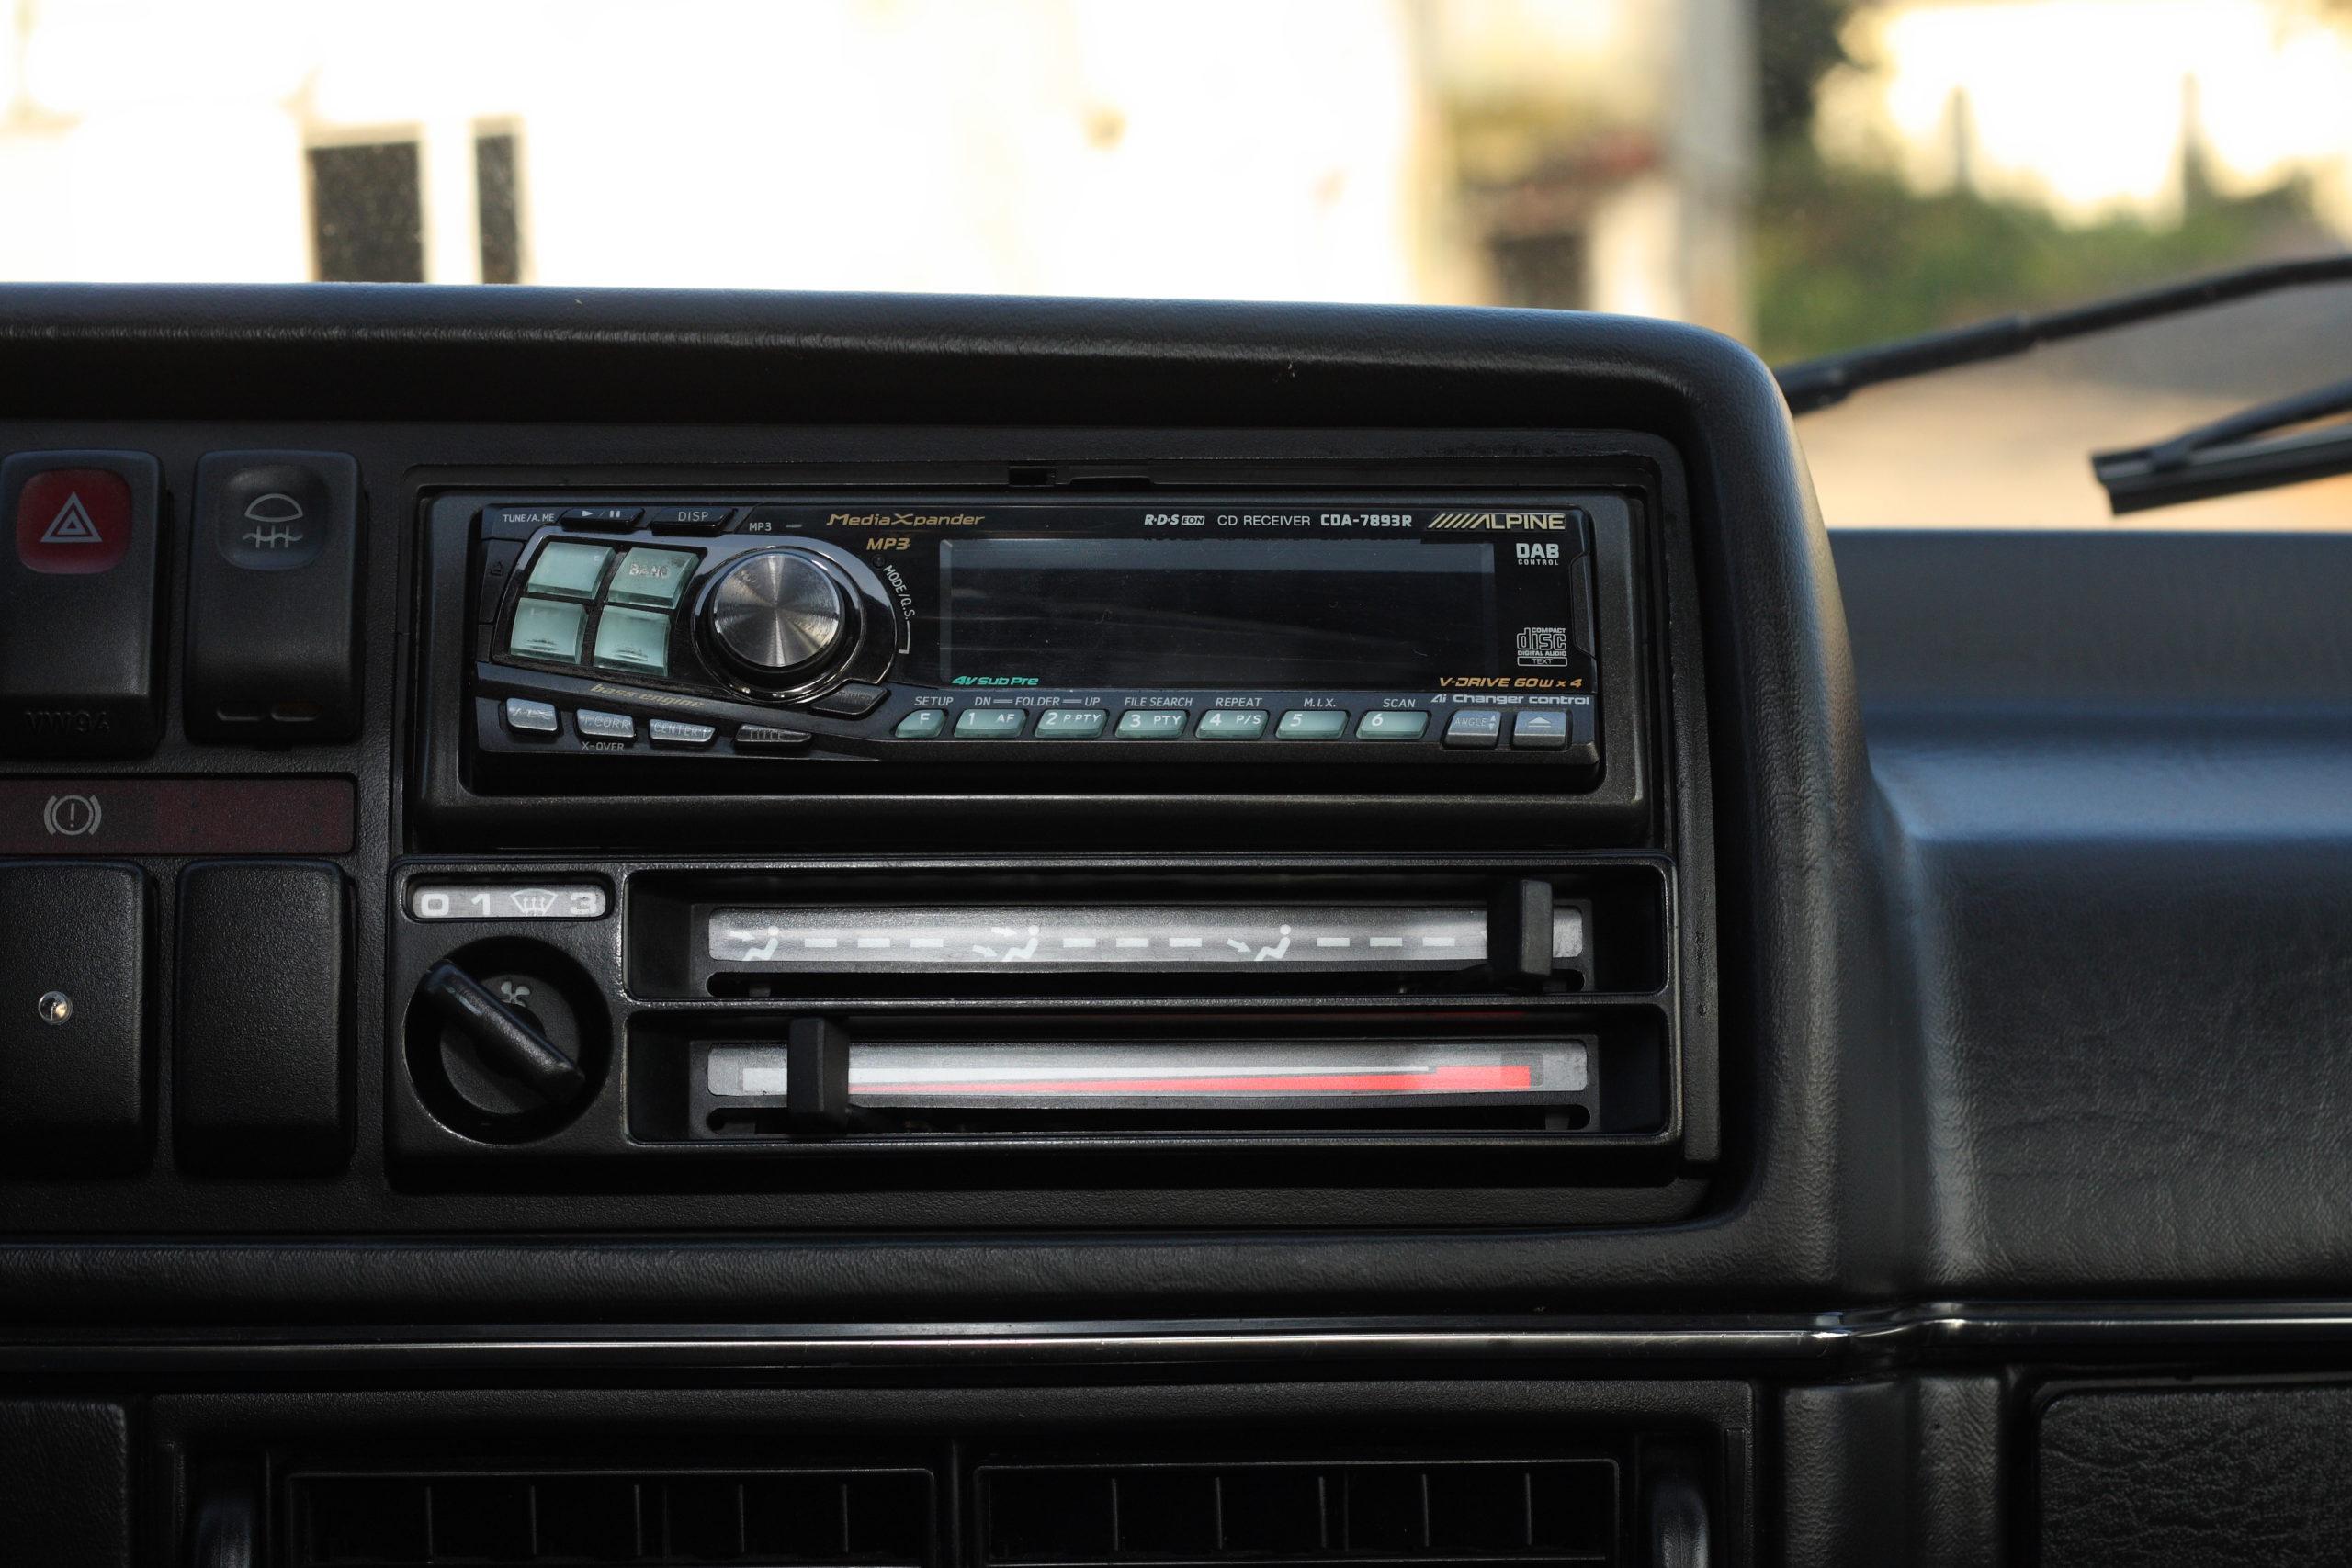 Tuning-VW-Golfa-Mk2-panel audio i wentylacji